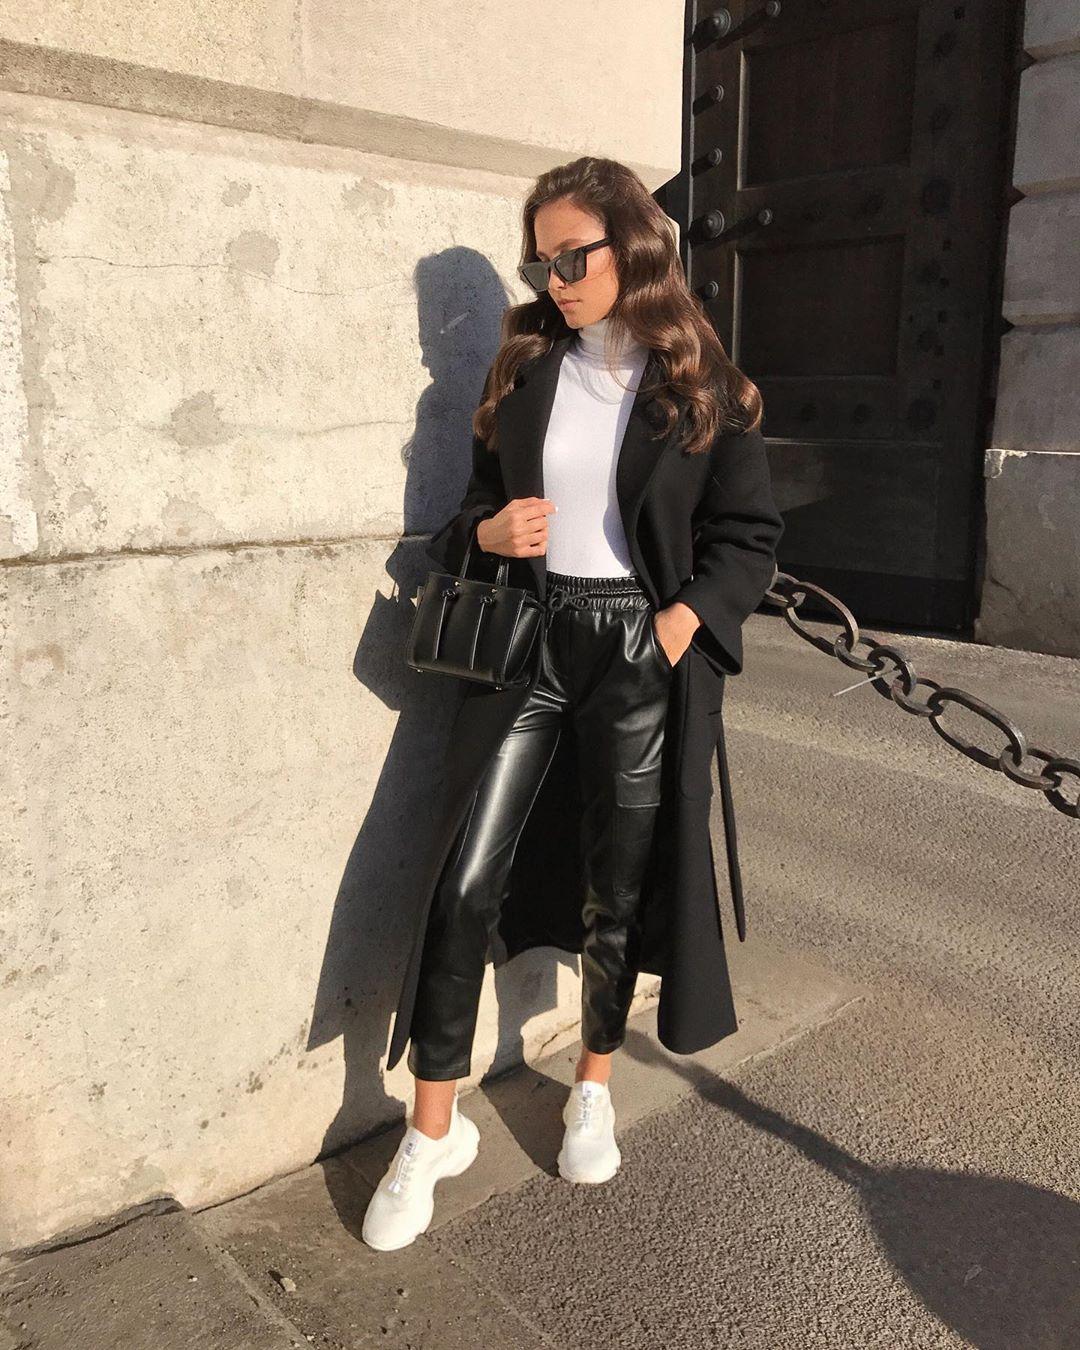 synthetic leather cargo pants de Zara sur majamarko7